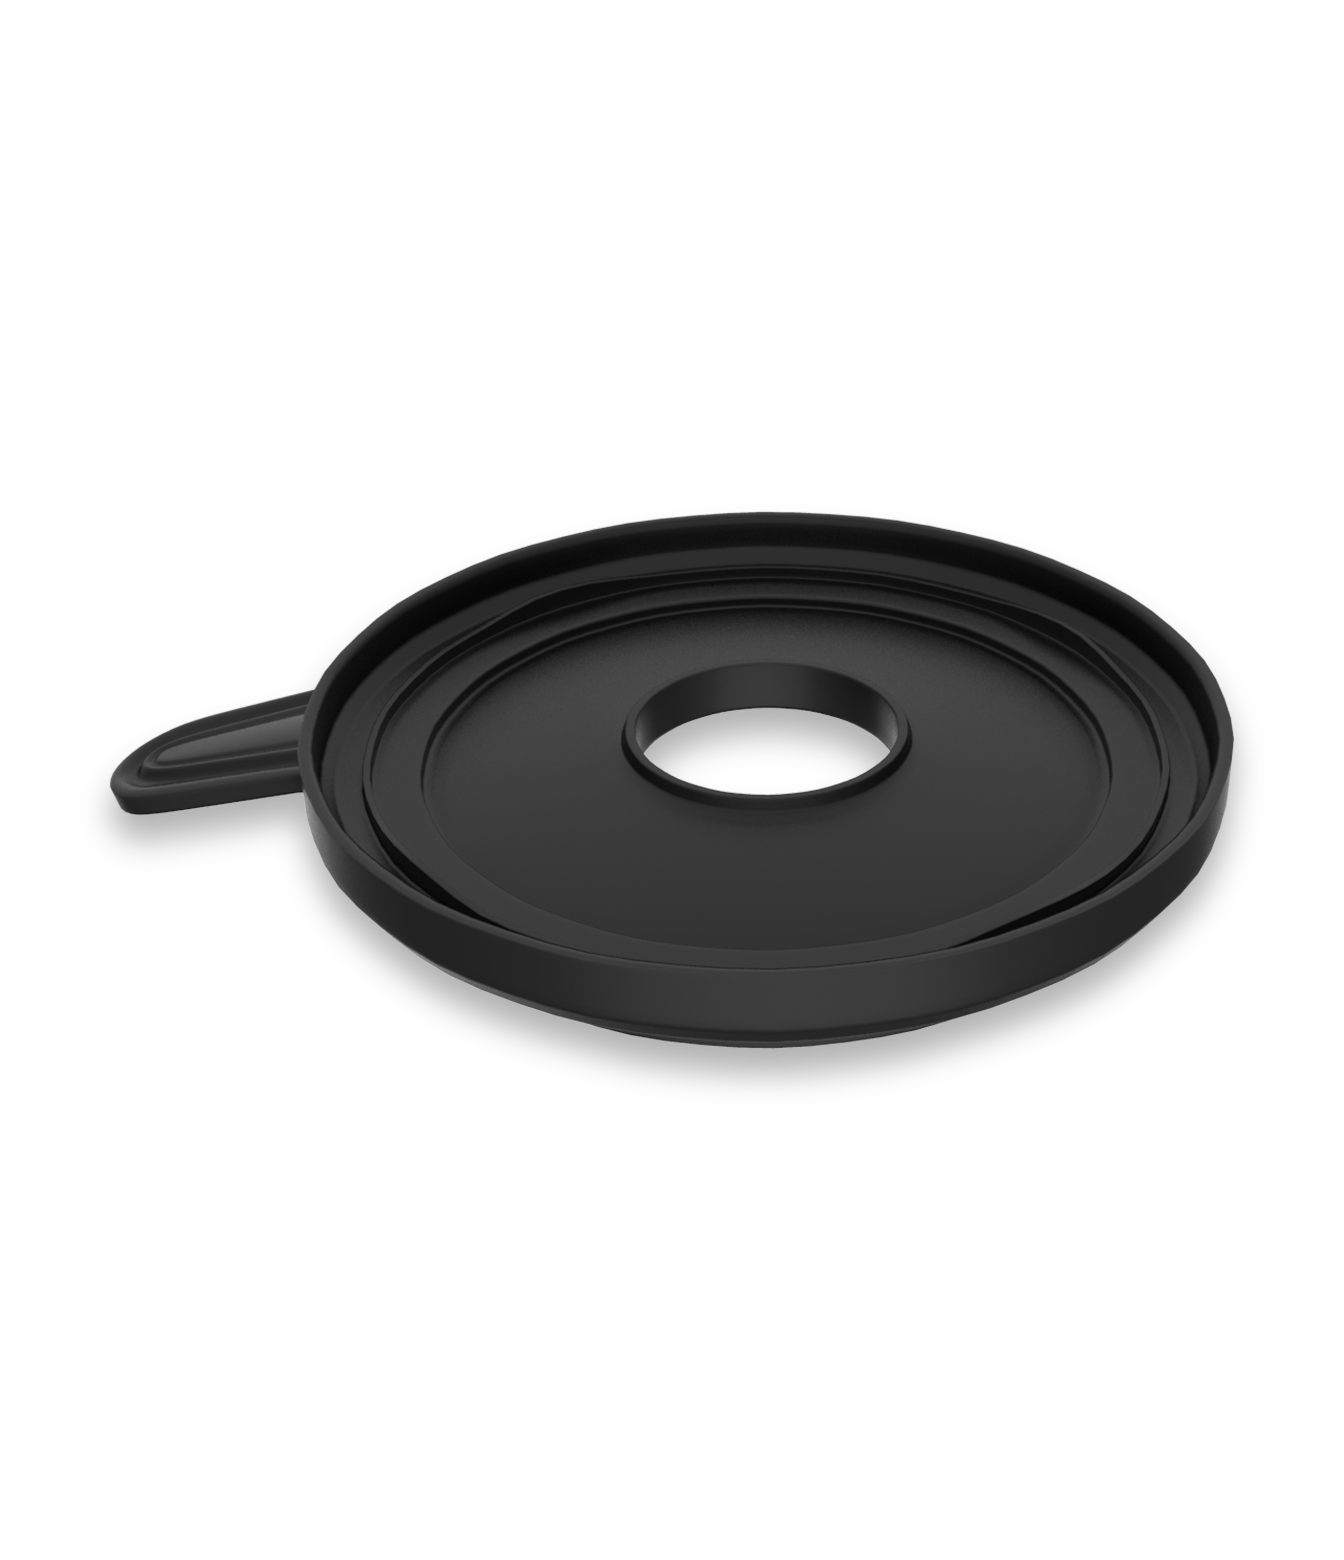 Mixing bowl lid